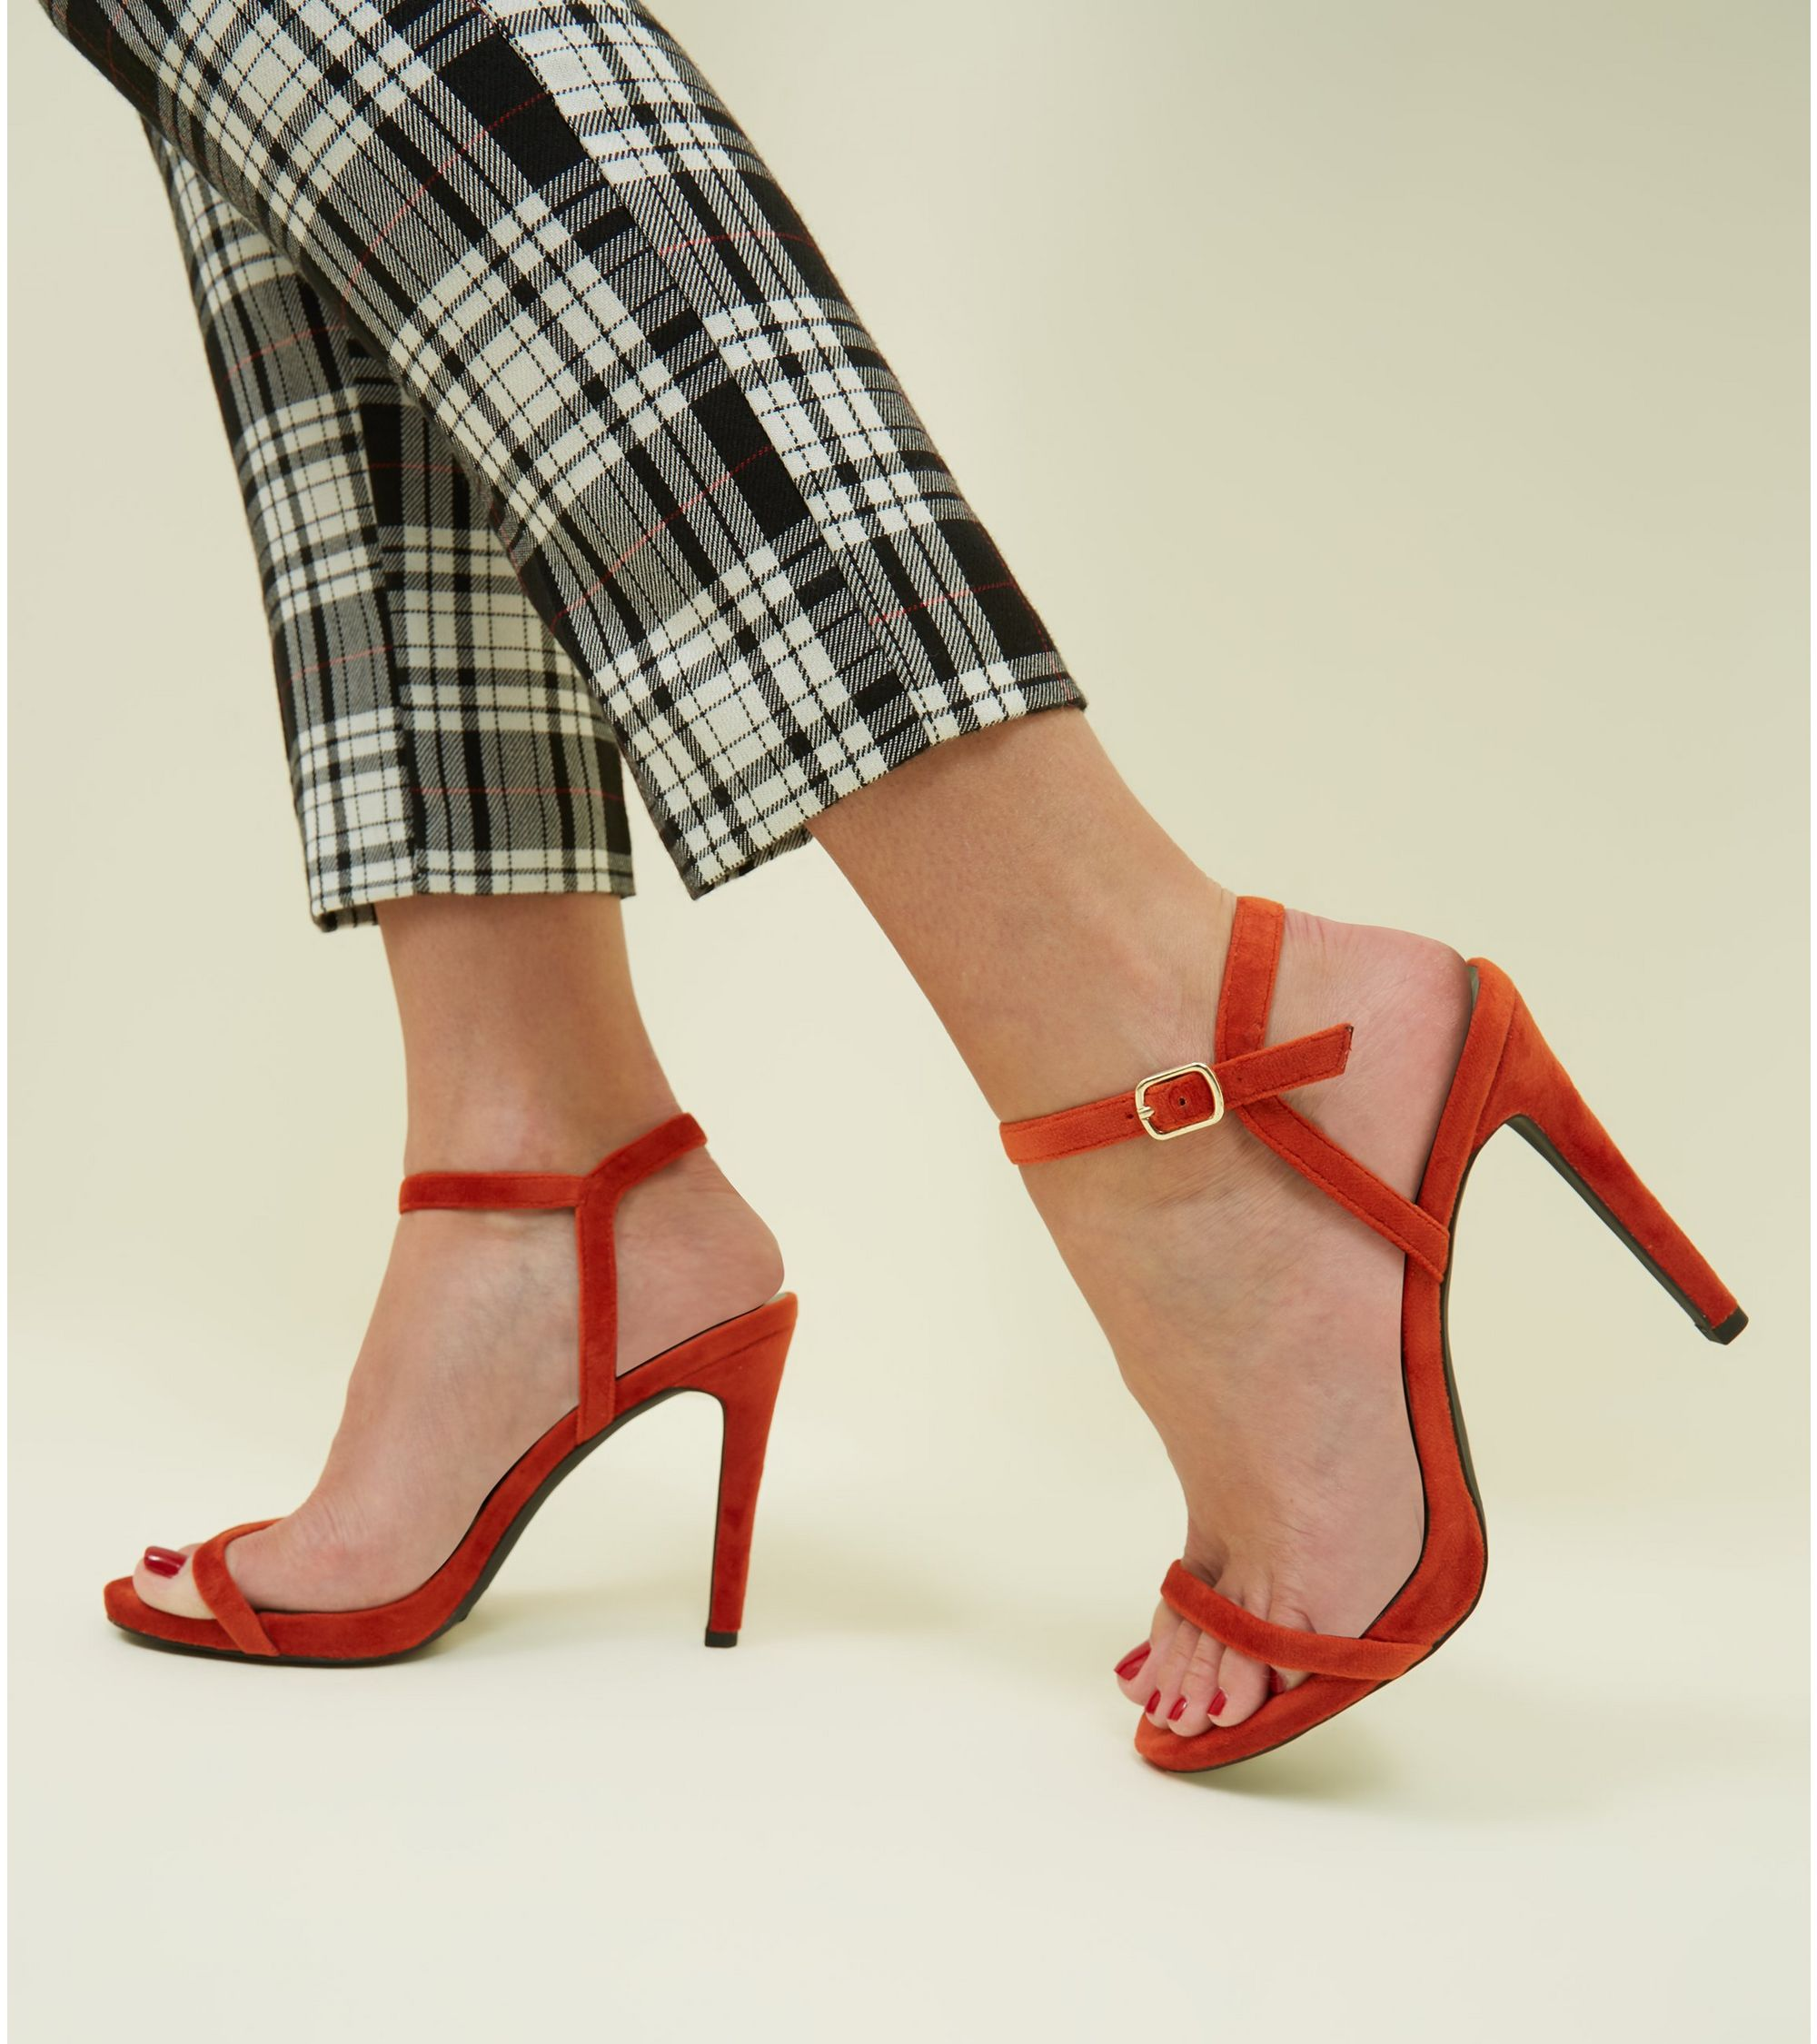 0aa4d79ac9c Bright Orange Velvet Stiletto Heel Sandals